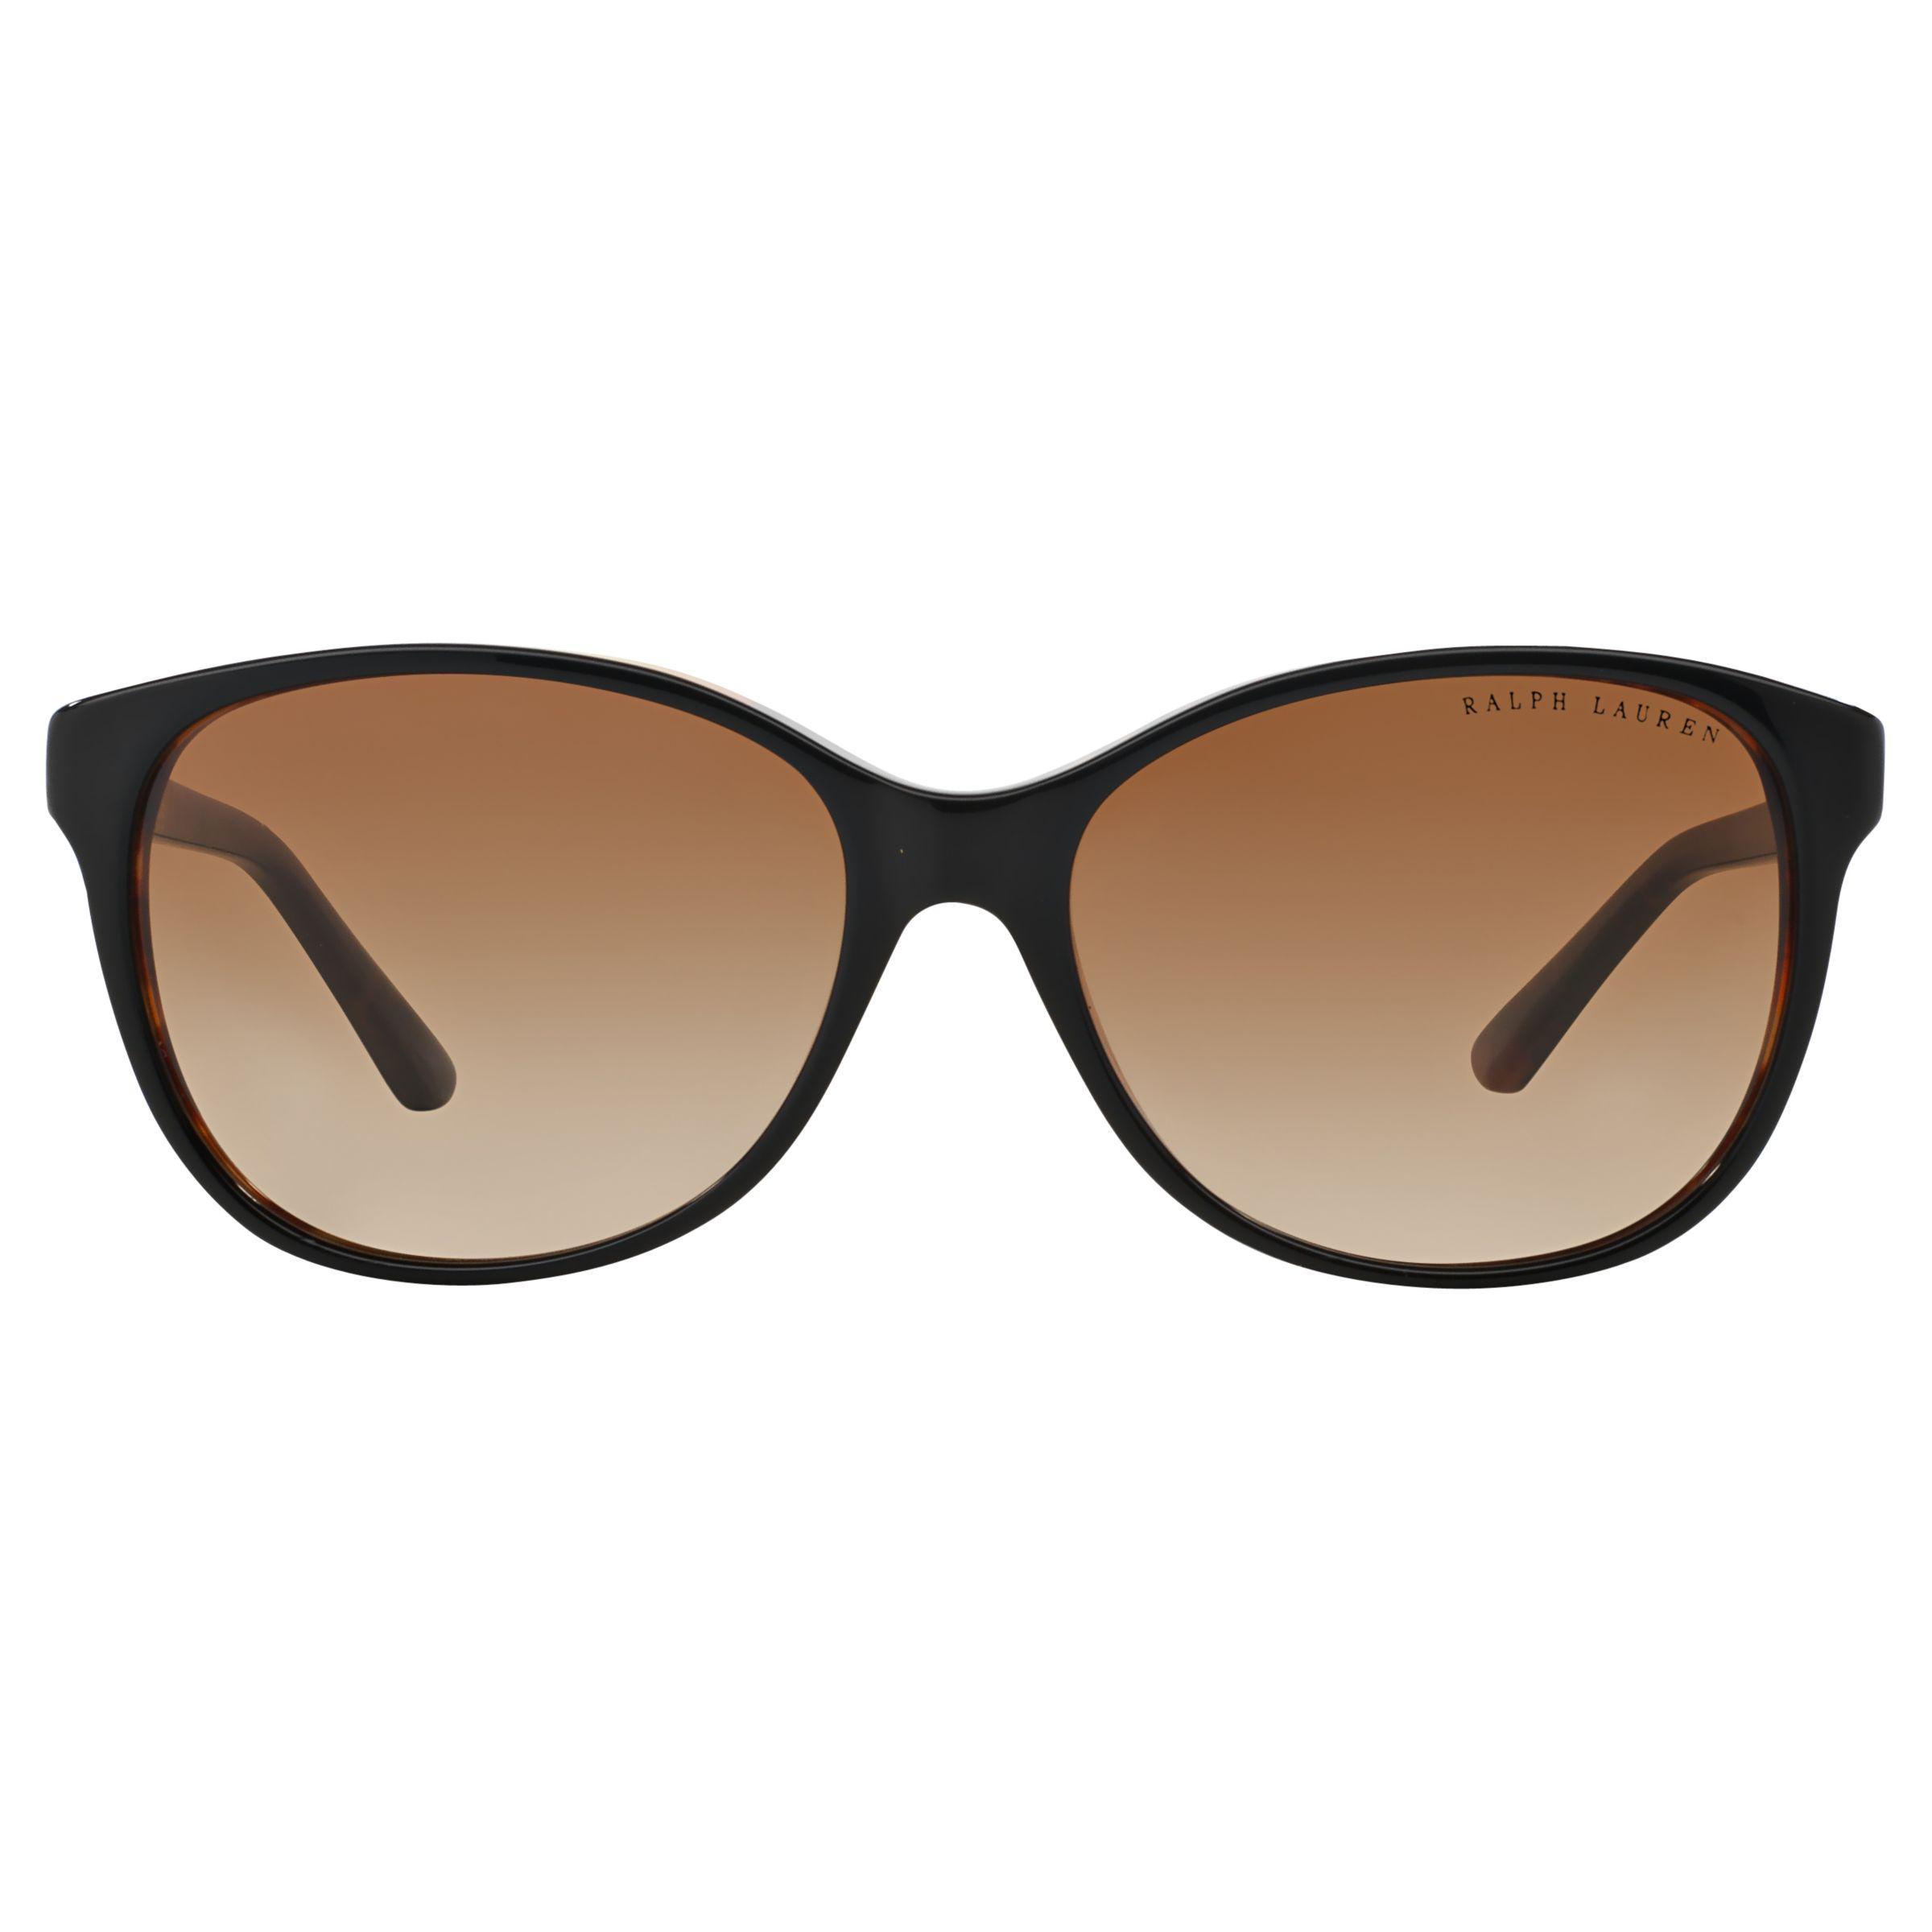 45826b52cf Ralph Lauren - Brown Rl8116 Cat s Eye Sunglasses - Lyst. View fullscreen